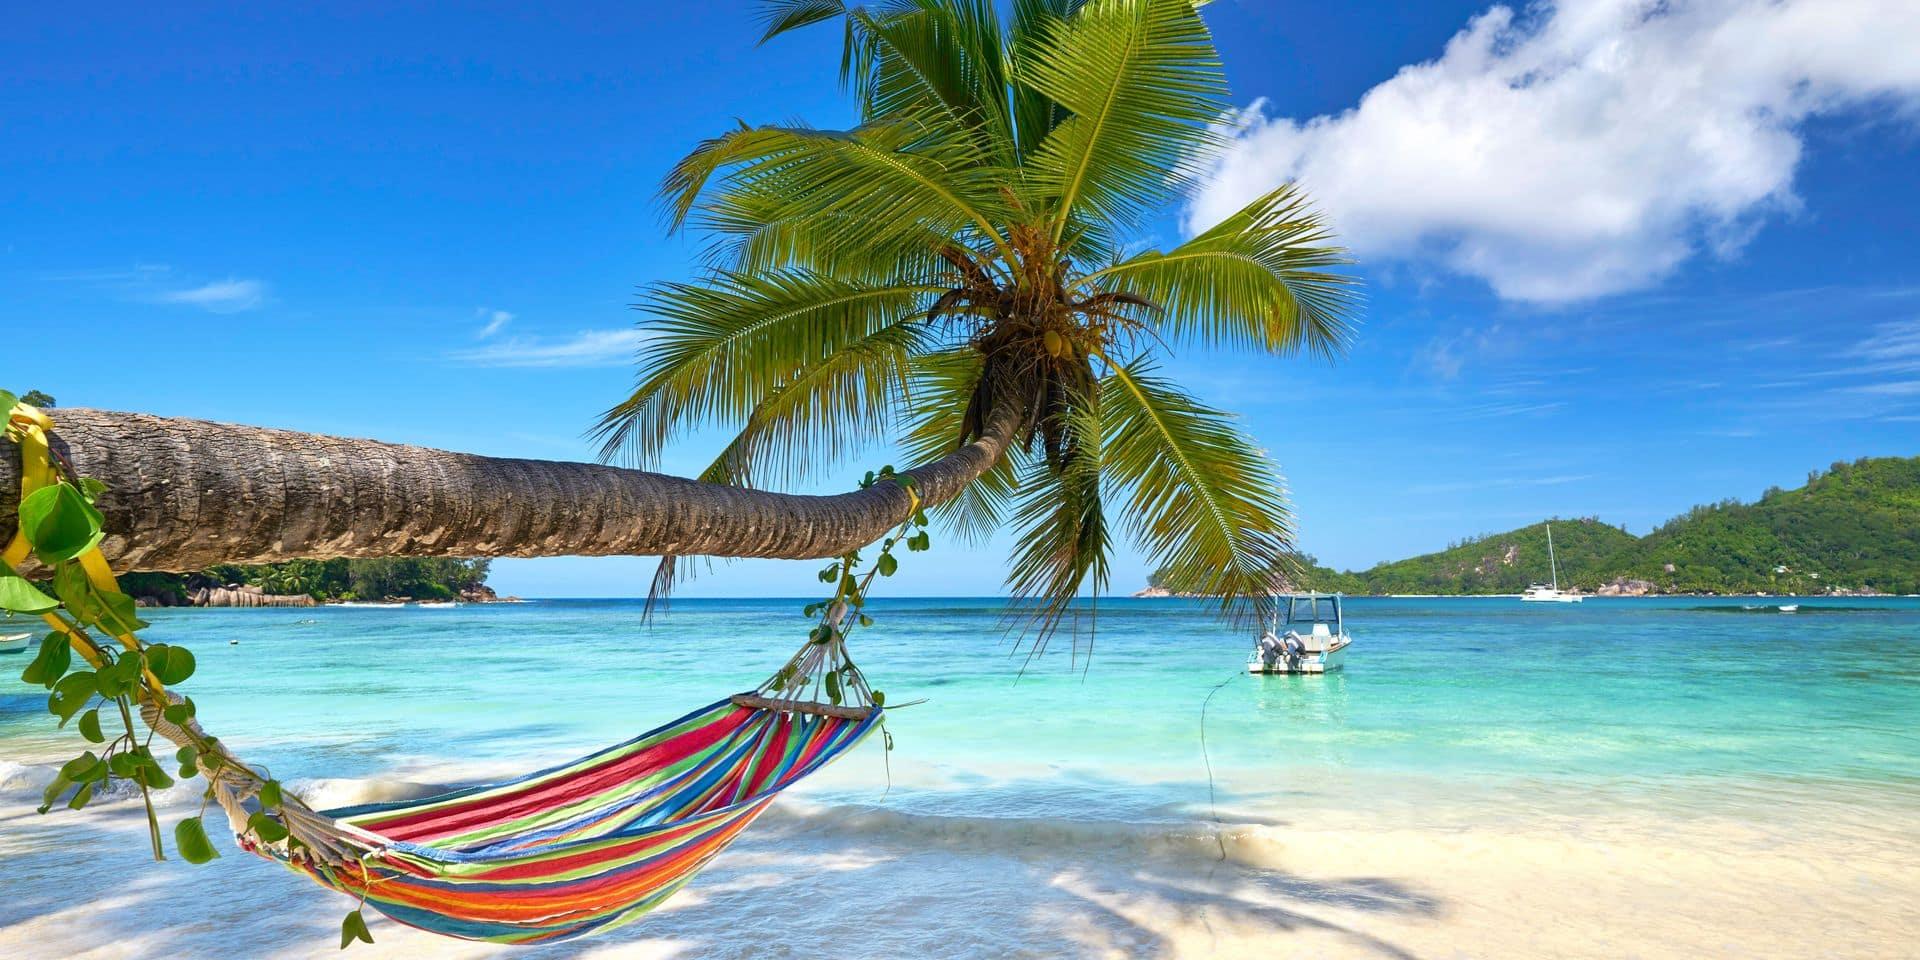 Romantic,Cozy,Hammock,In,The,Shadow,Of,Coconut,Palm,Tree